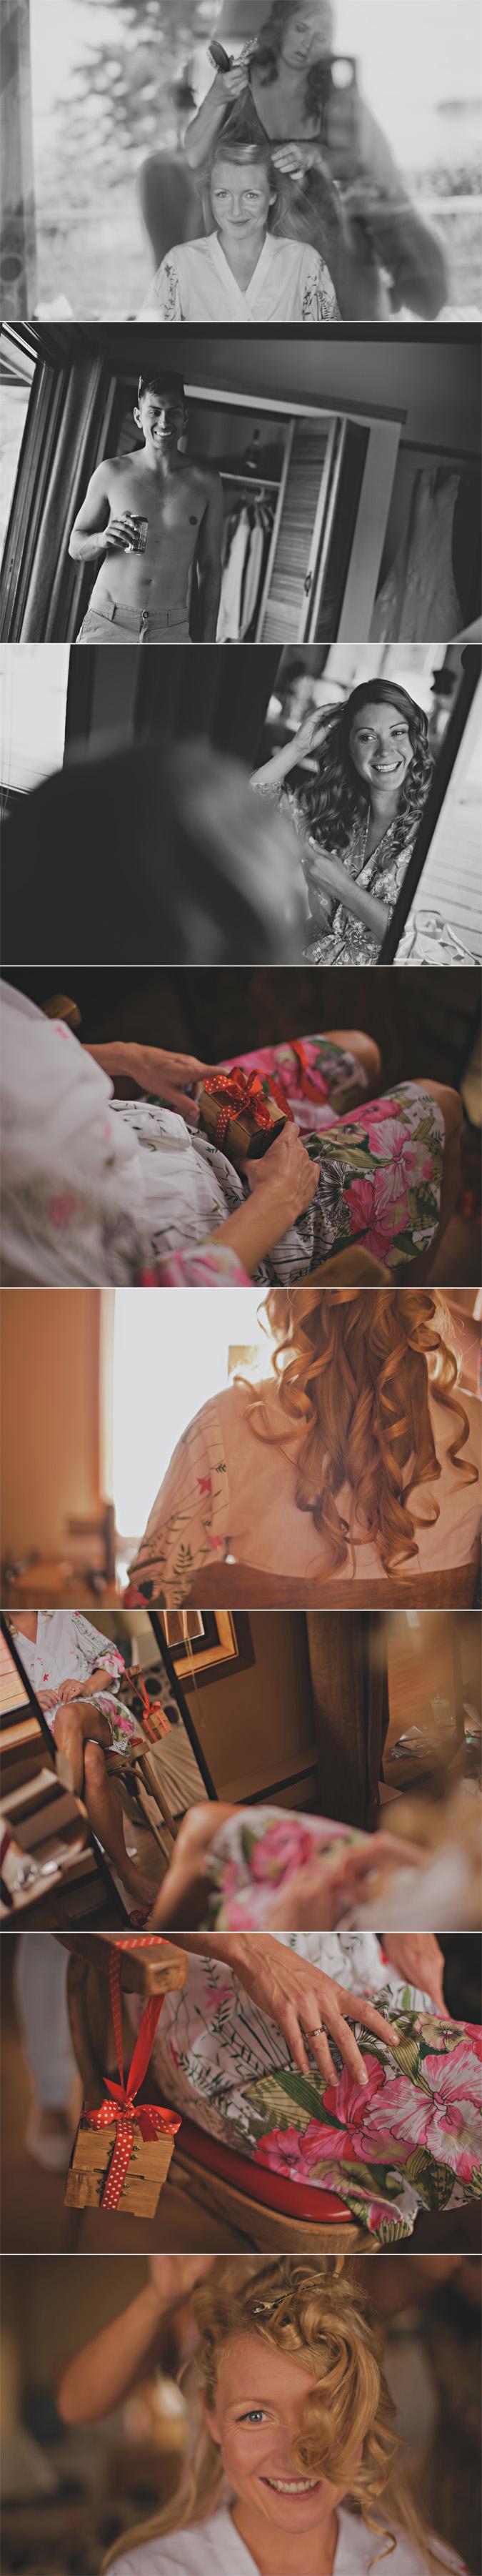 bride getting ready on her wedding day on hornby island, bc